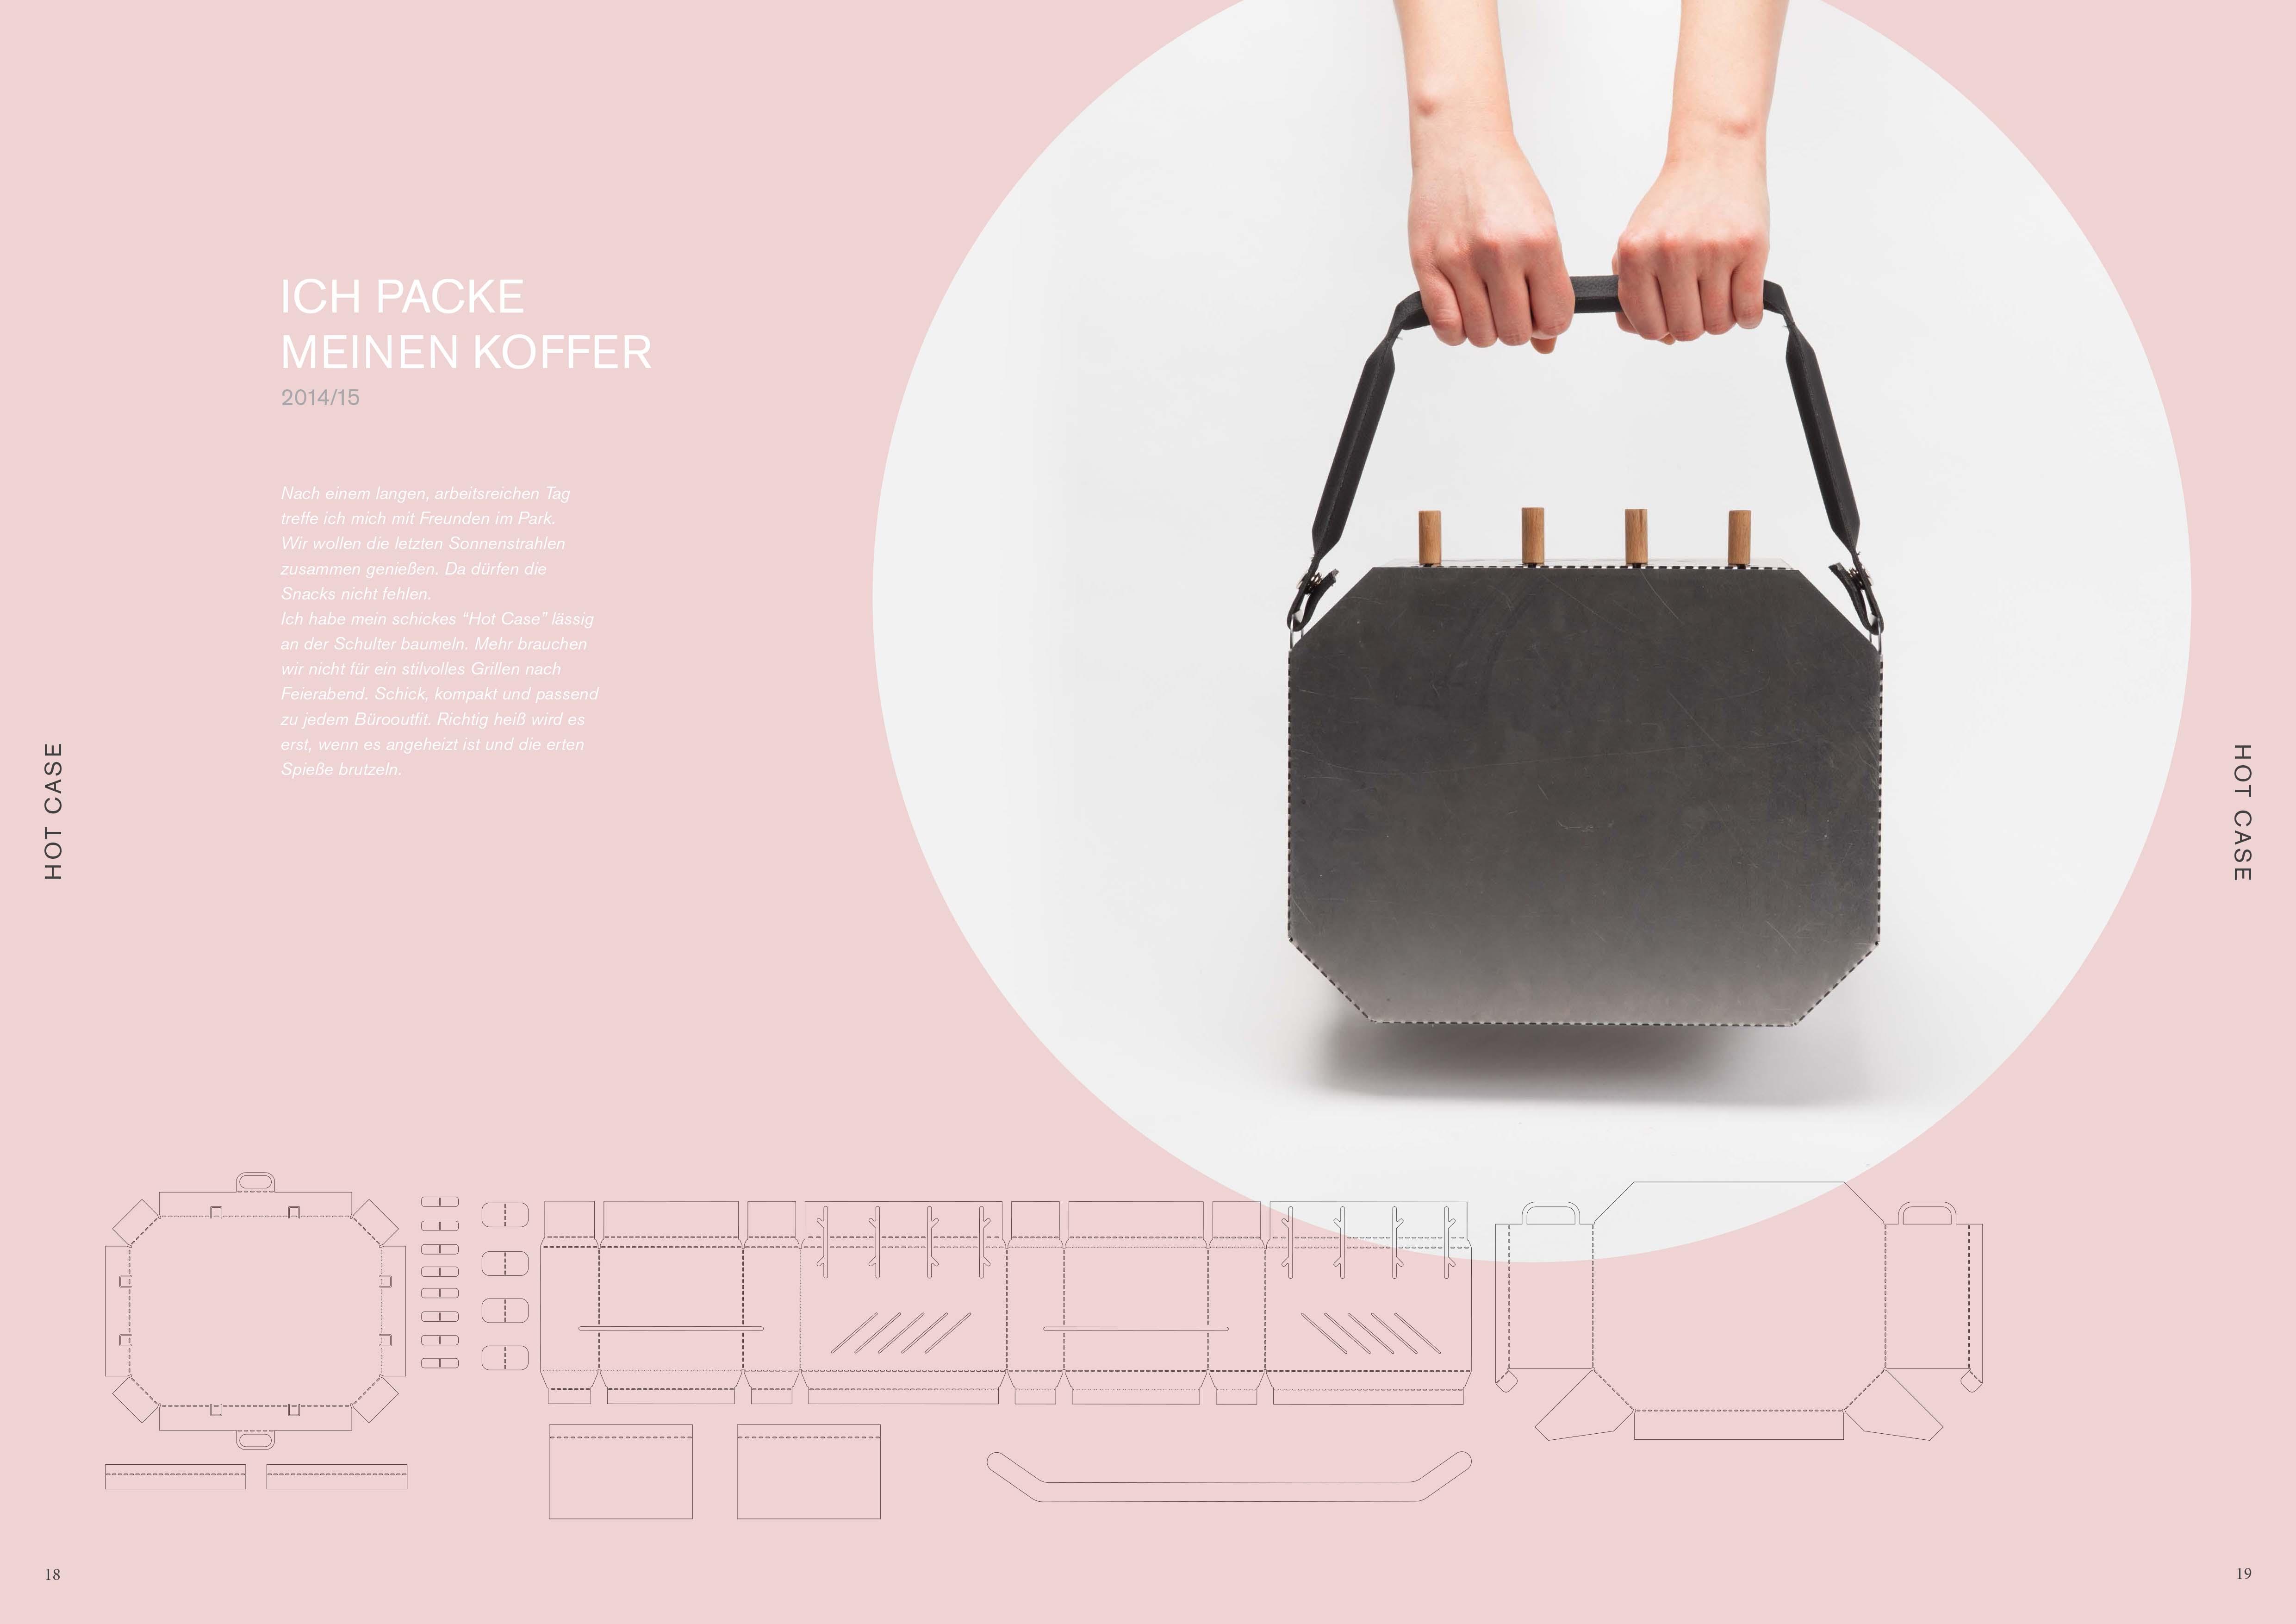 Produkt Design Berlin das portfolioprojekt studiengang design